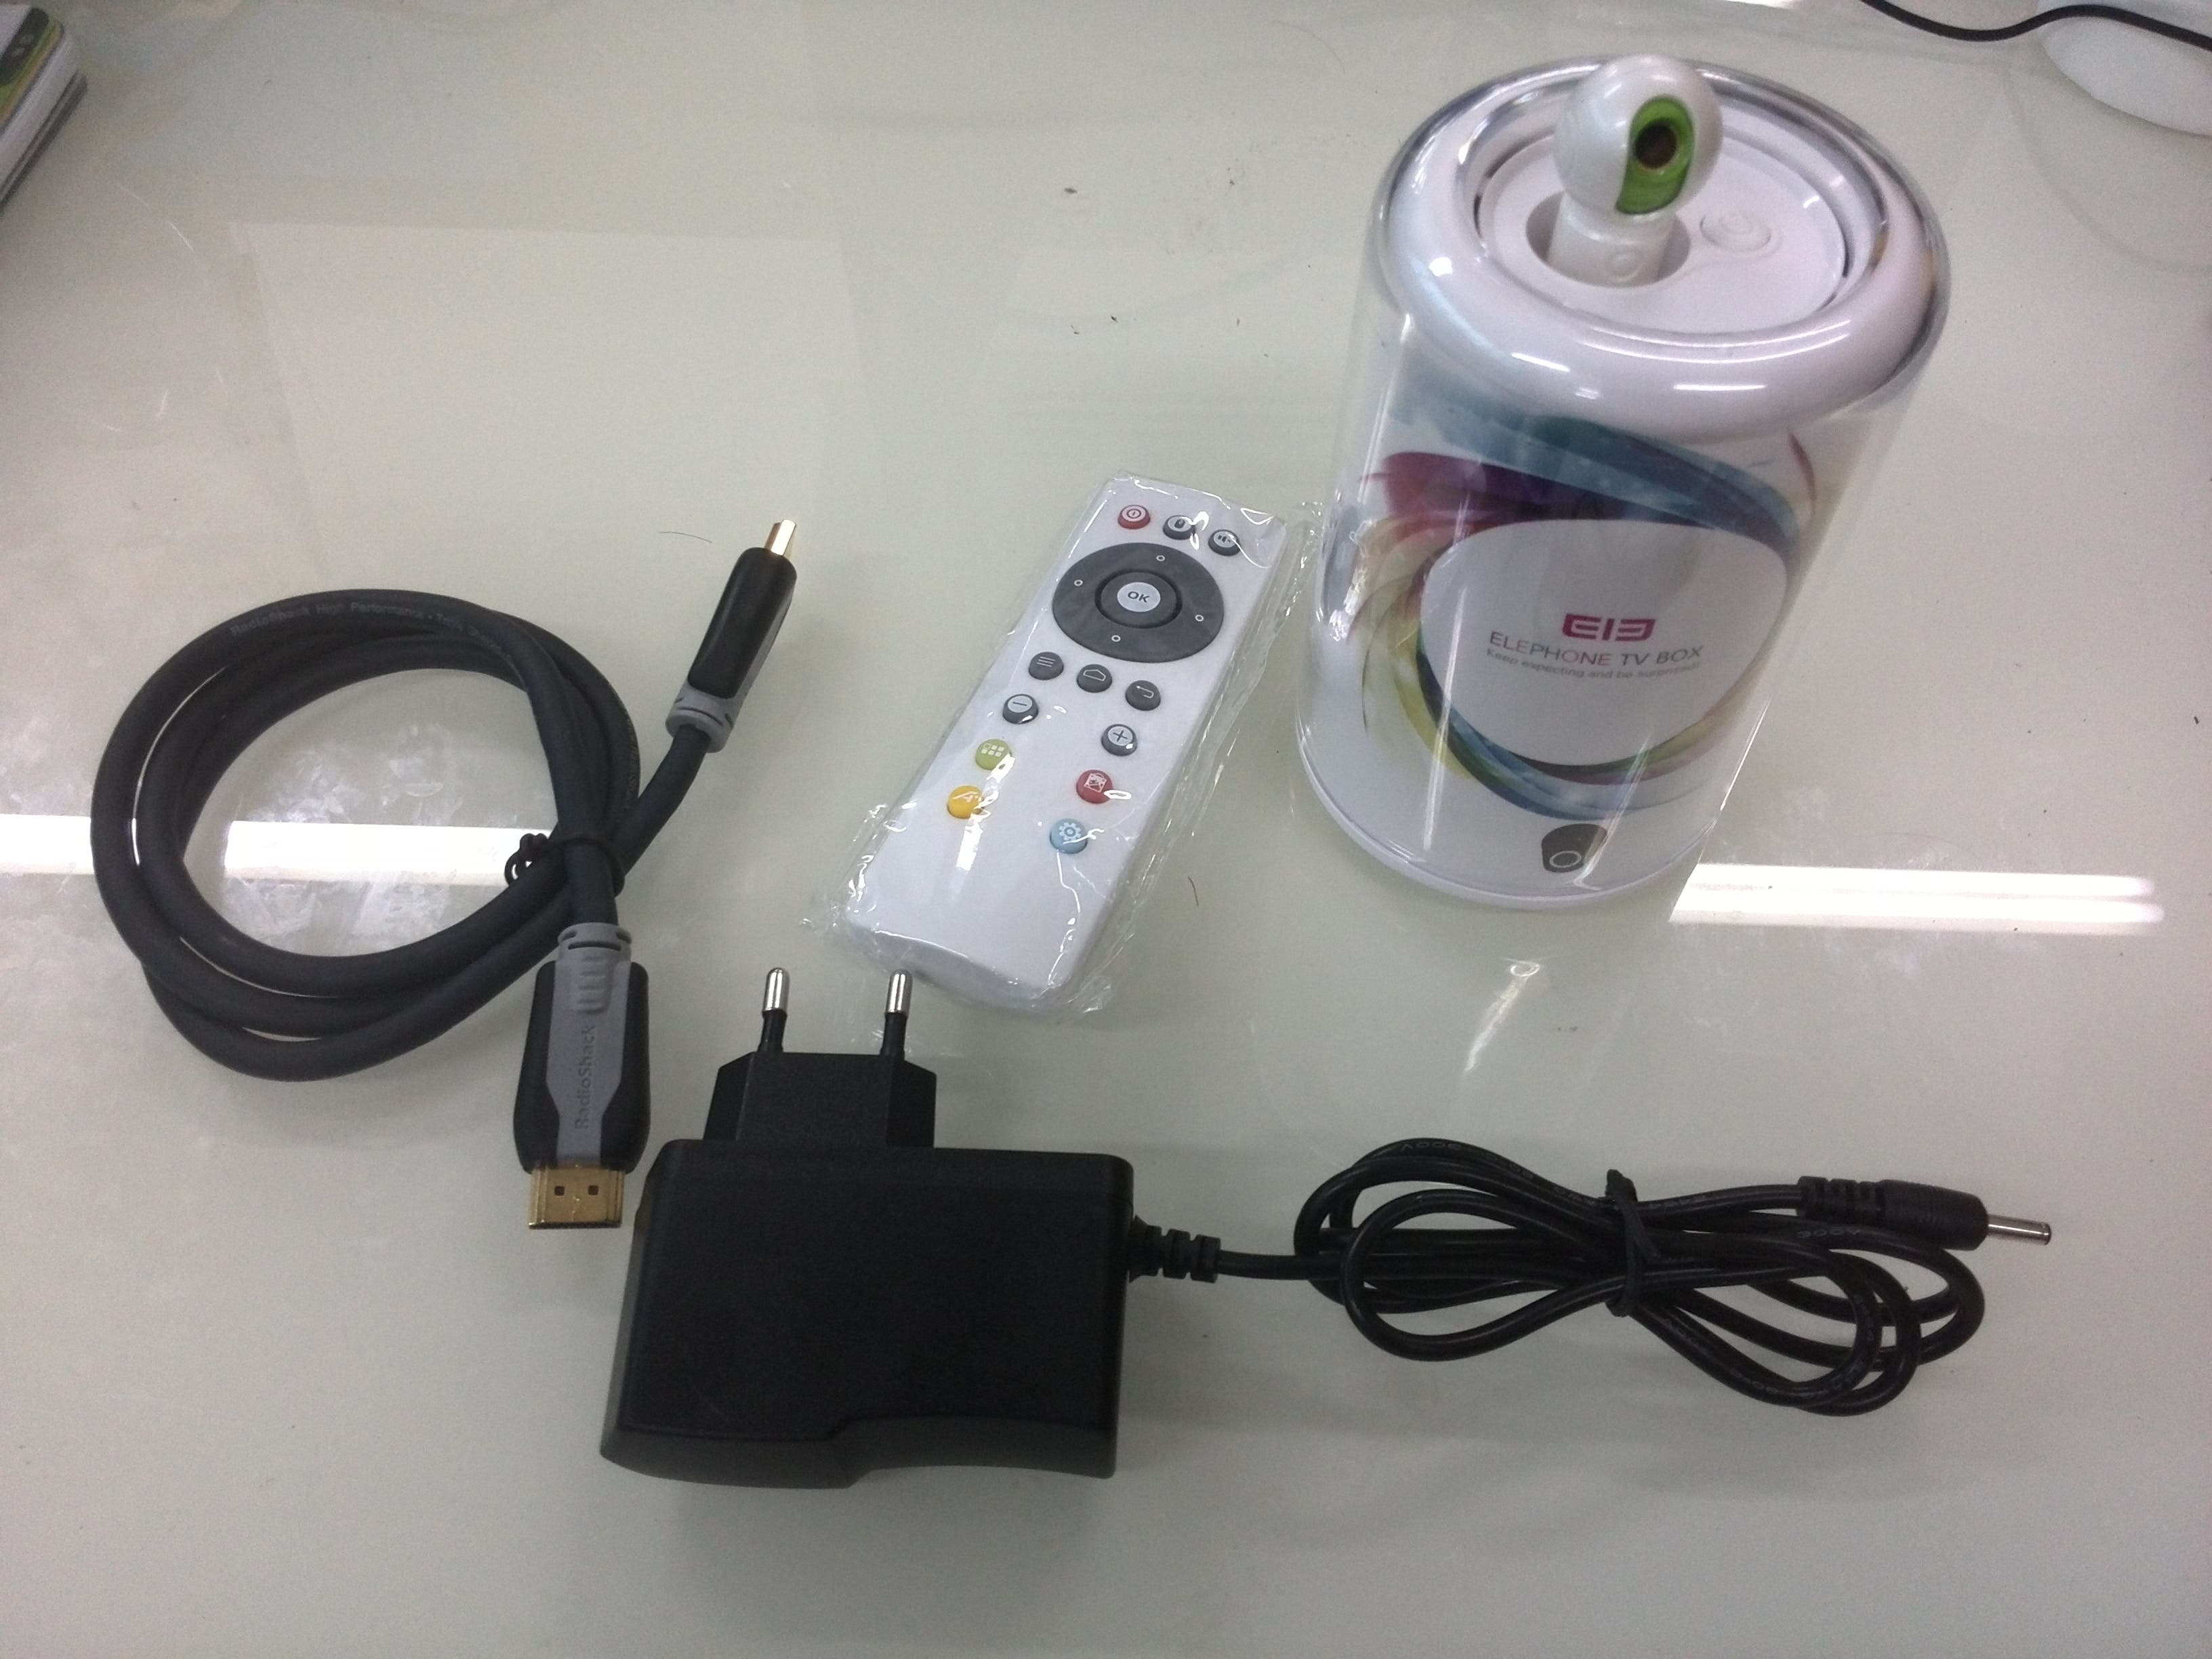 elephone tv box